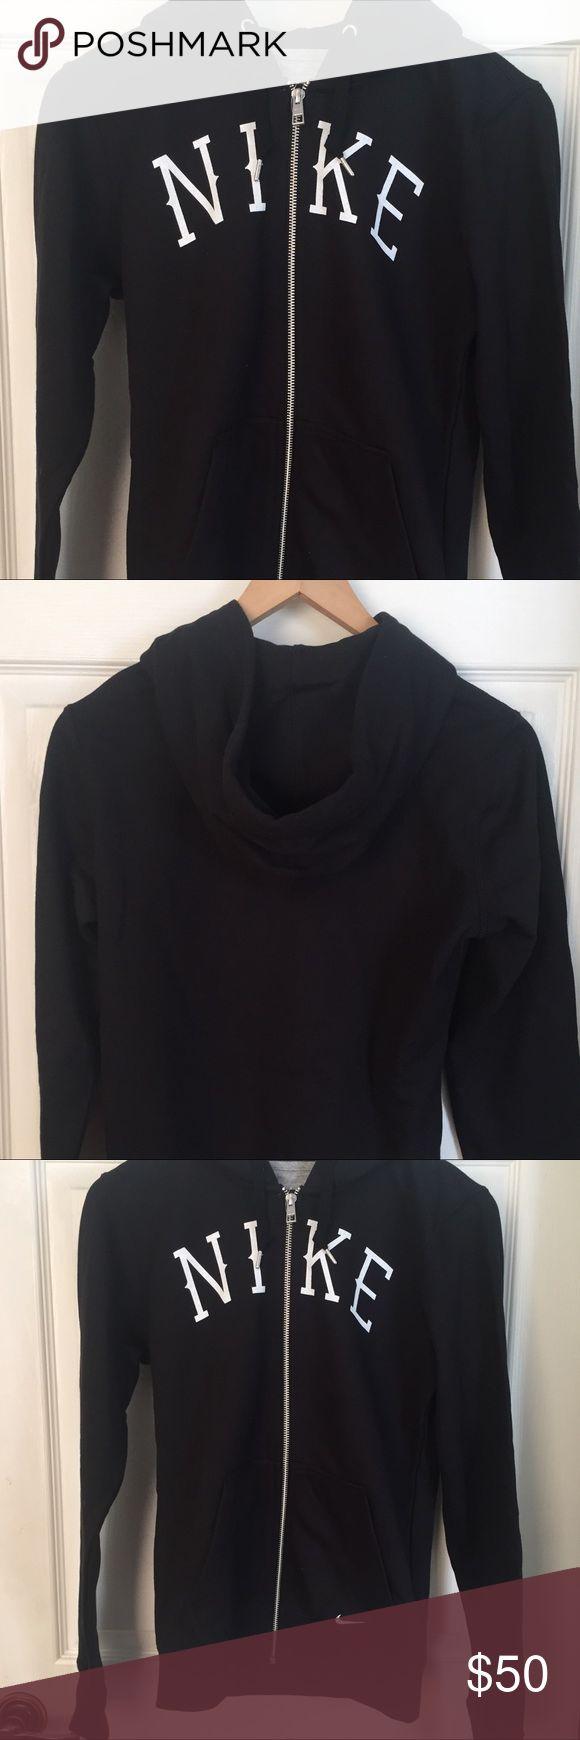 NWT: Nike zip up hoodie New black Nike zip up jacket in perfect condition. Accepting offers. Nike Tops Sweatshirts & Hoodies